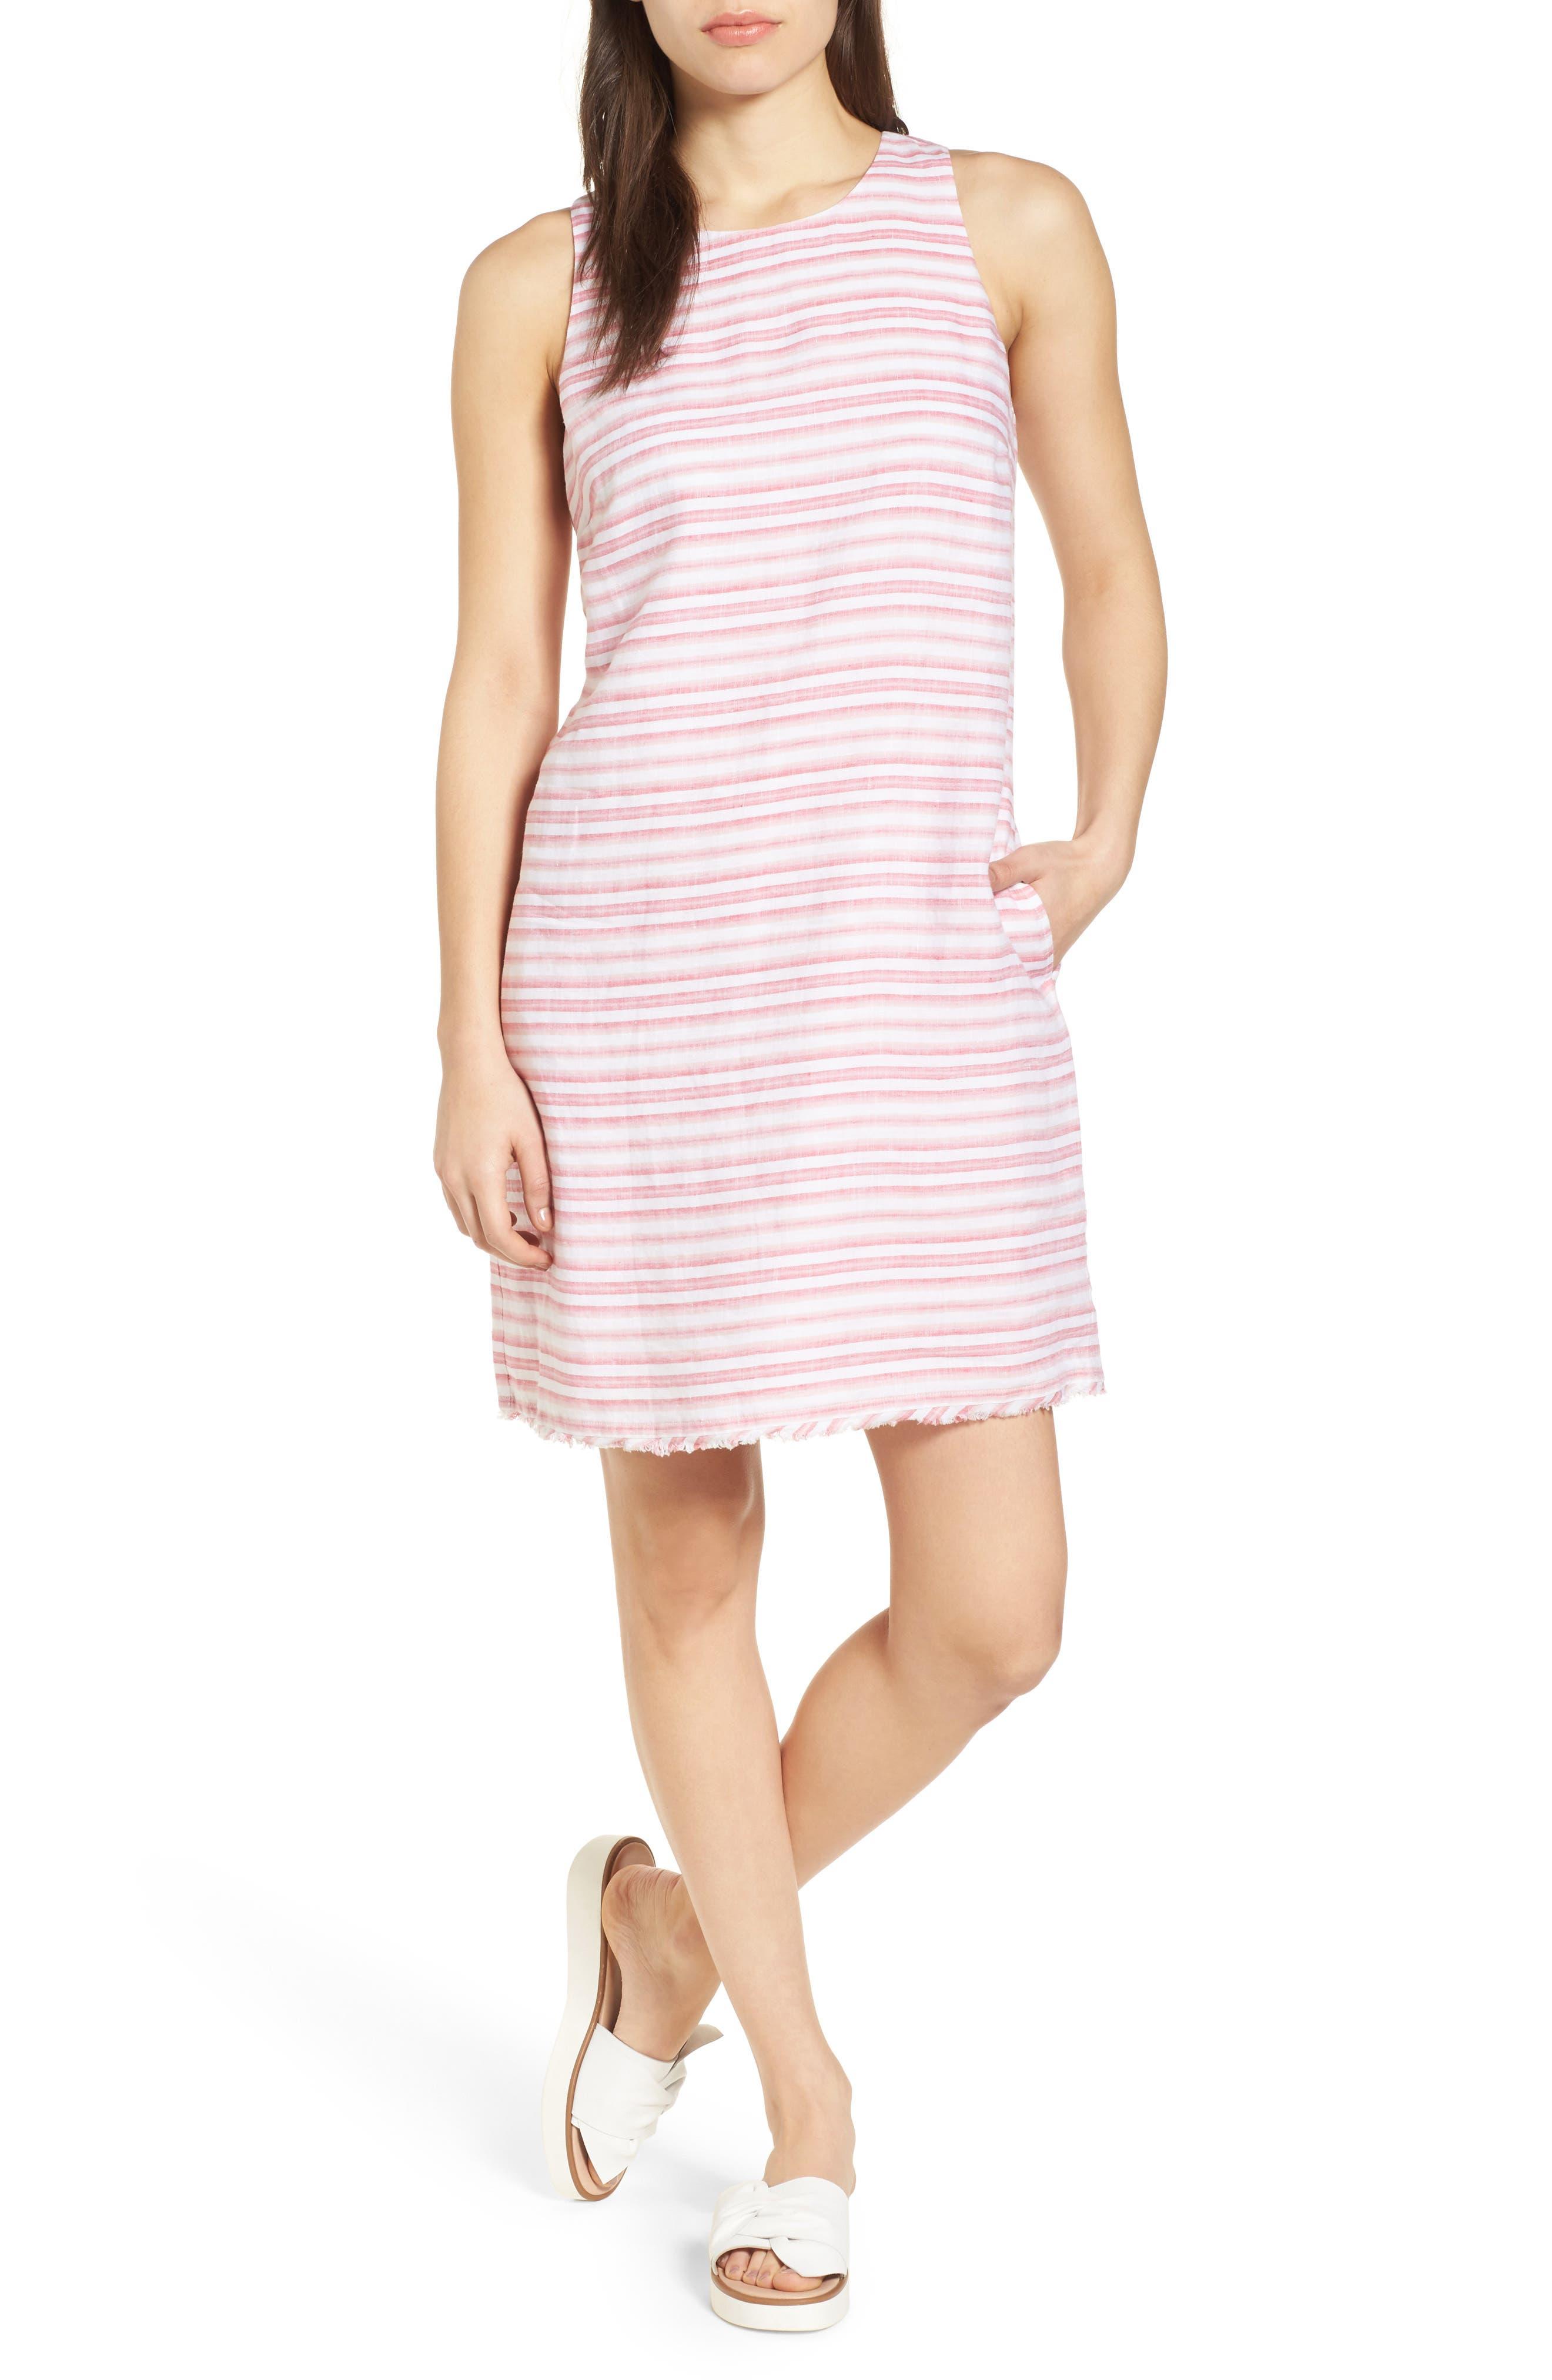 Bella Hermosa Linen Shift Dress,                             Main thumbnail 1, color,                             French Rose